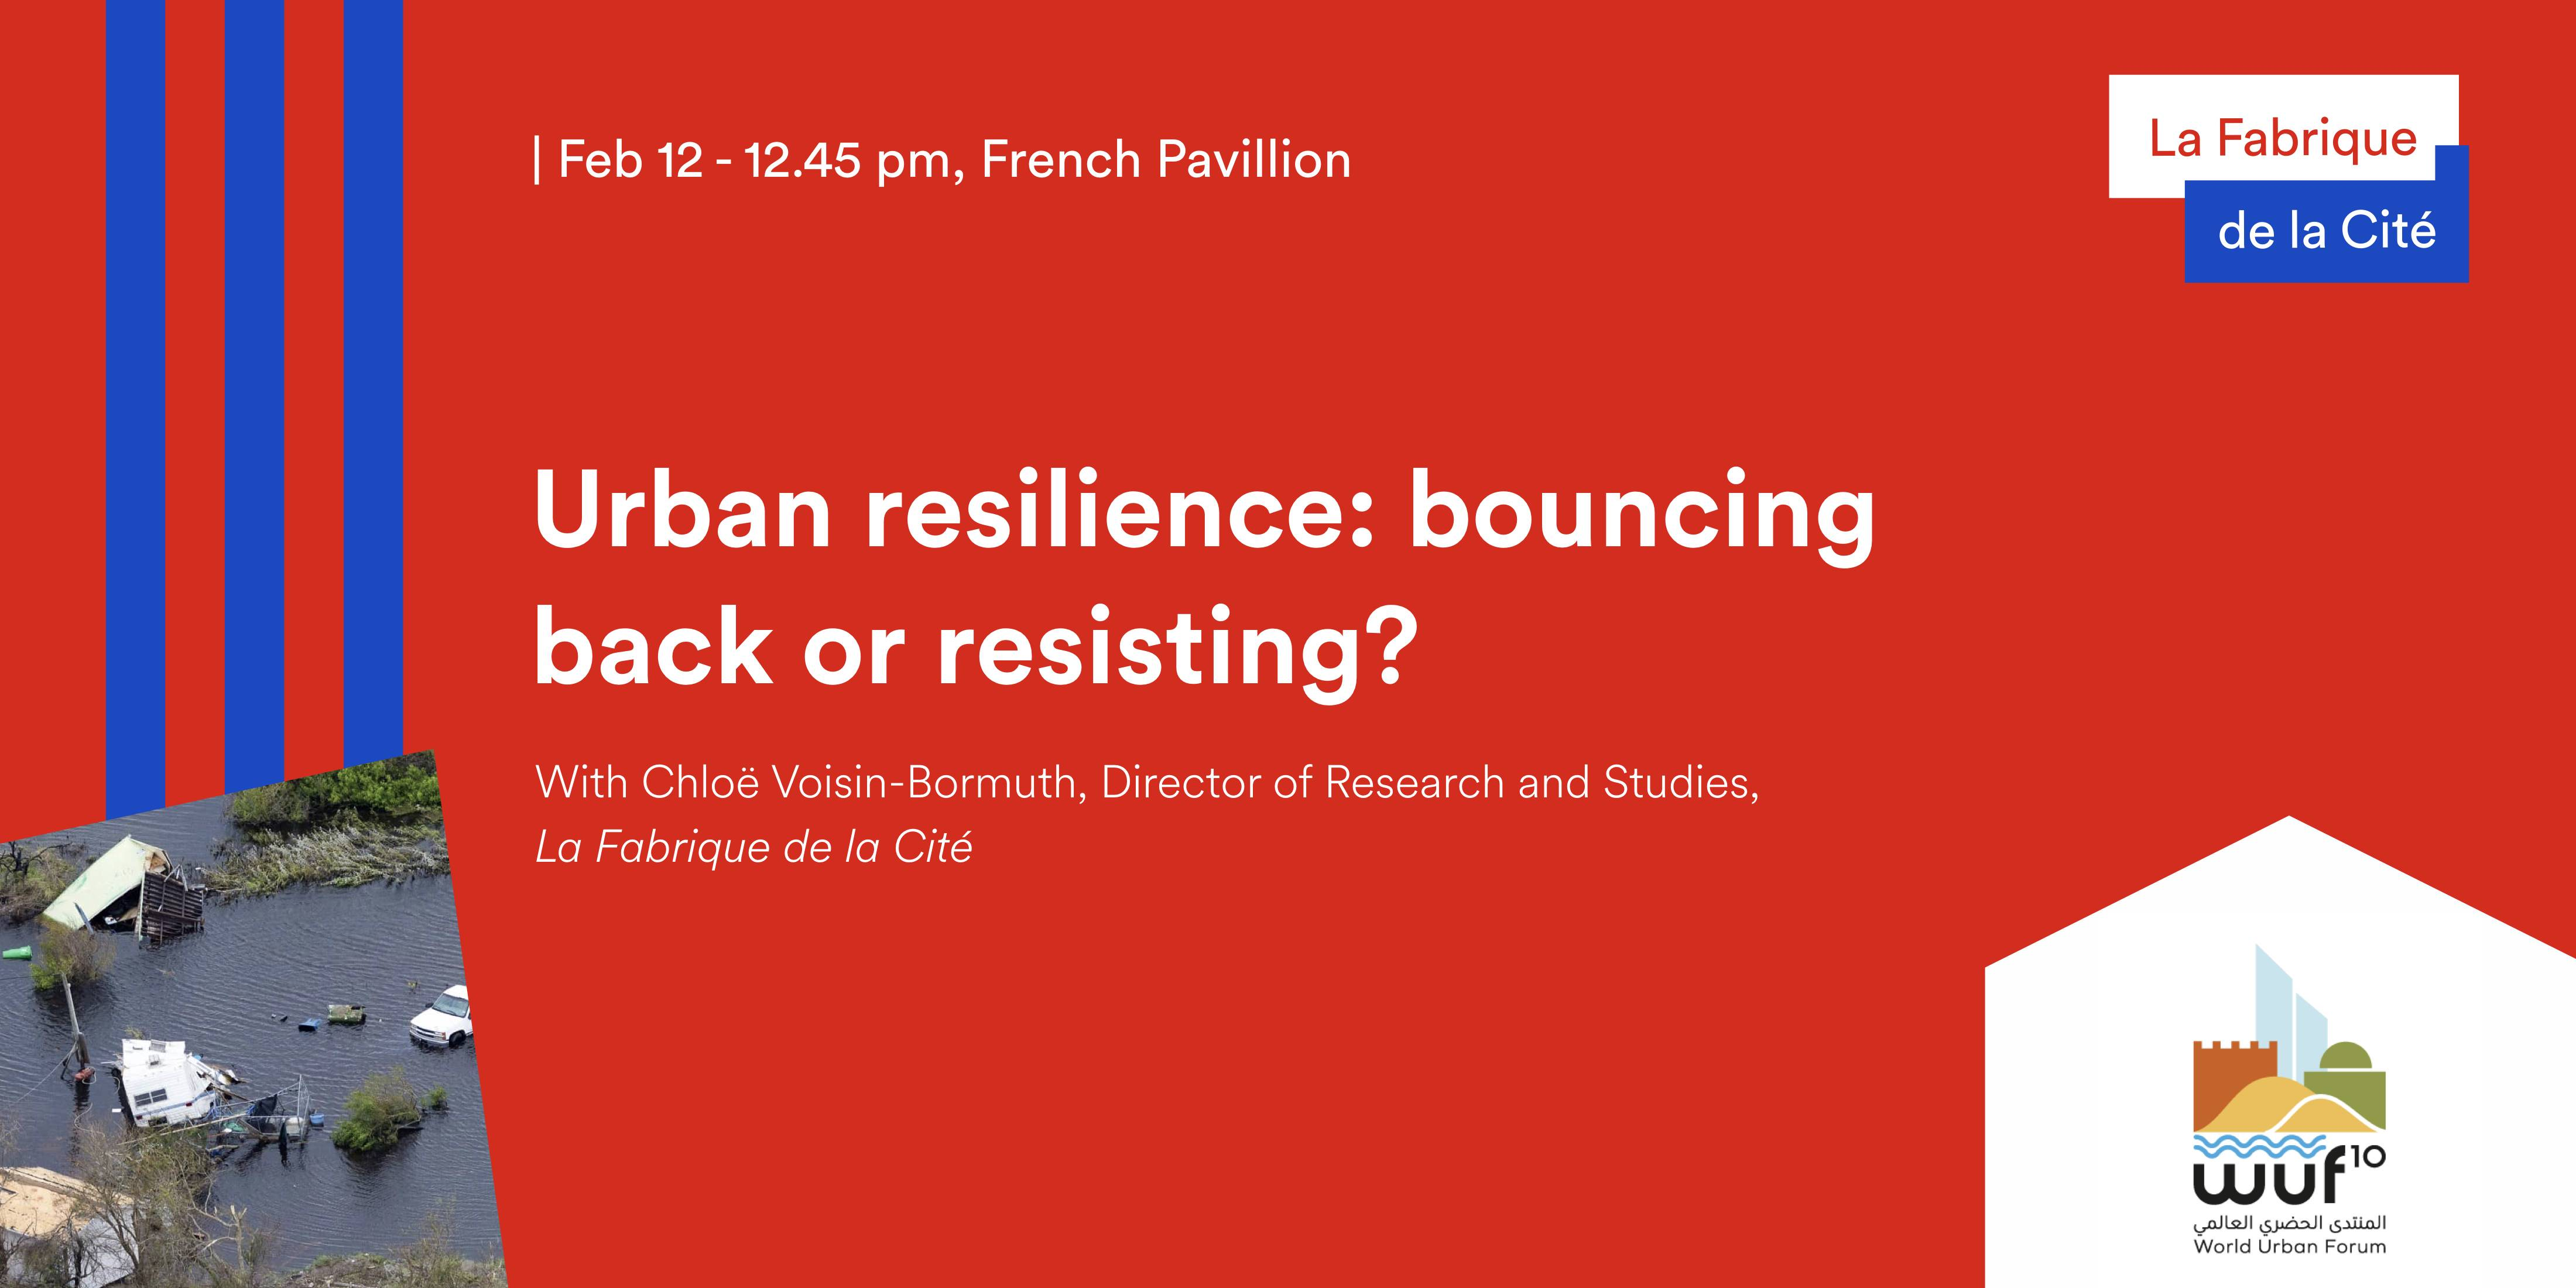 Urban resilience, La Fabrique de la Cite, WUF10 (Abu Dhabi)